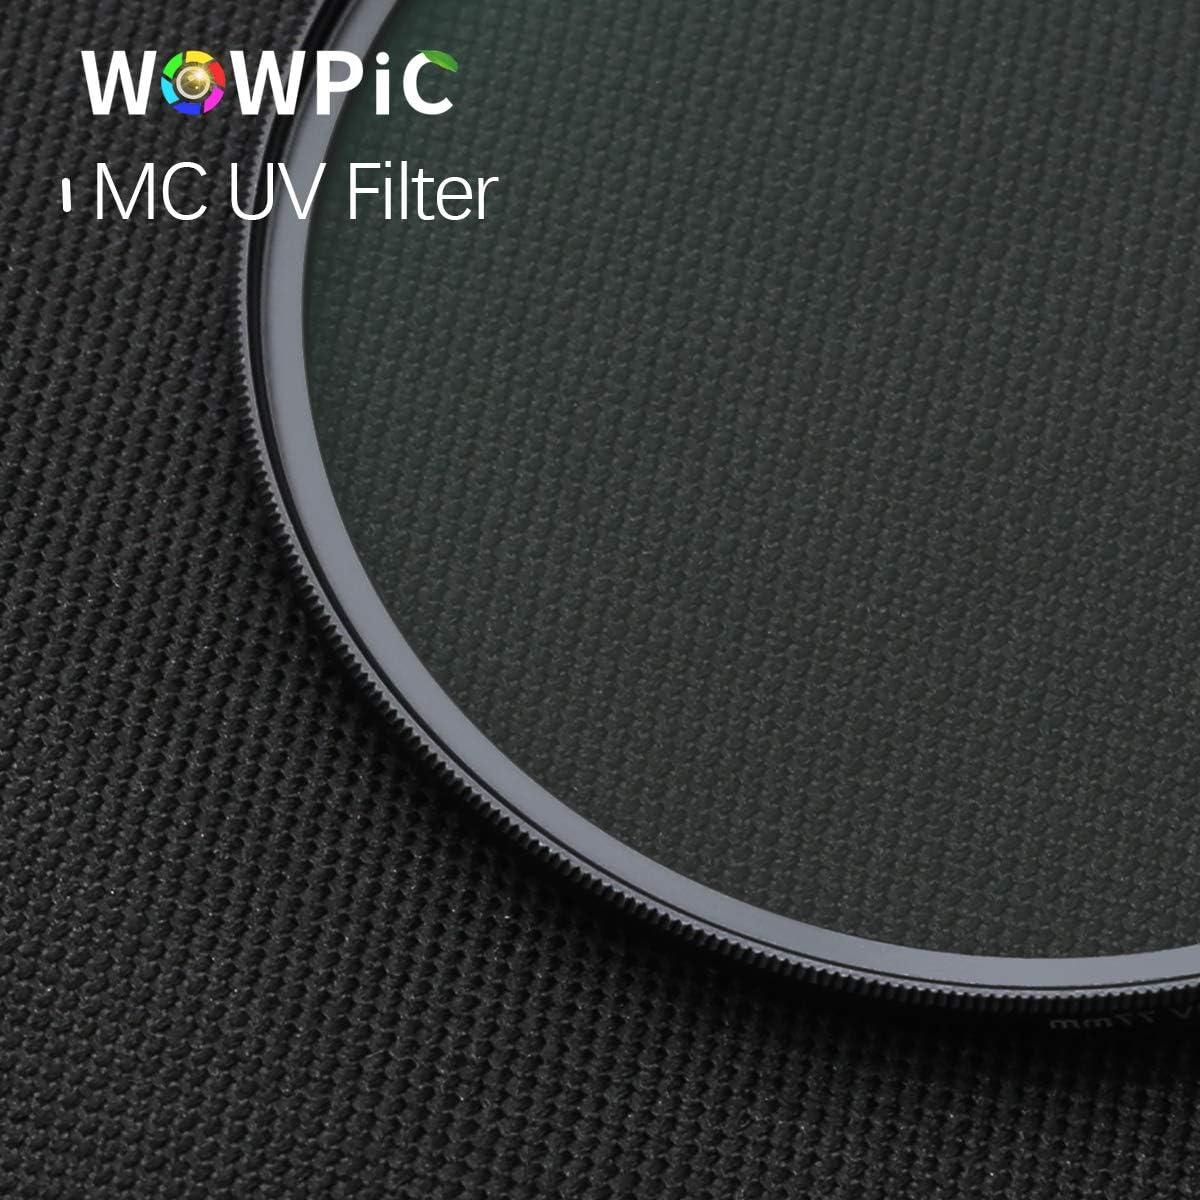 Uv Filter for Camera Lens,Premium UV Filter 58mm ∙ Schott Glass 16Layers Multi Coated ∙ Super Slim Aluminium Ultraviolet Lens ∙ Protective Filter